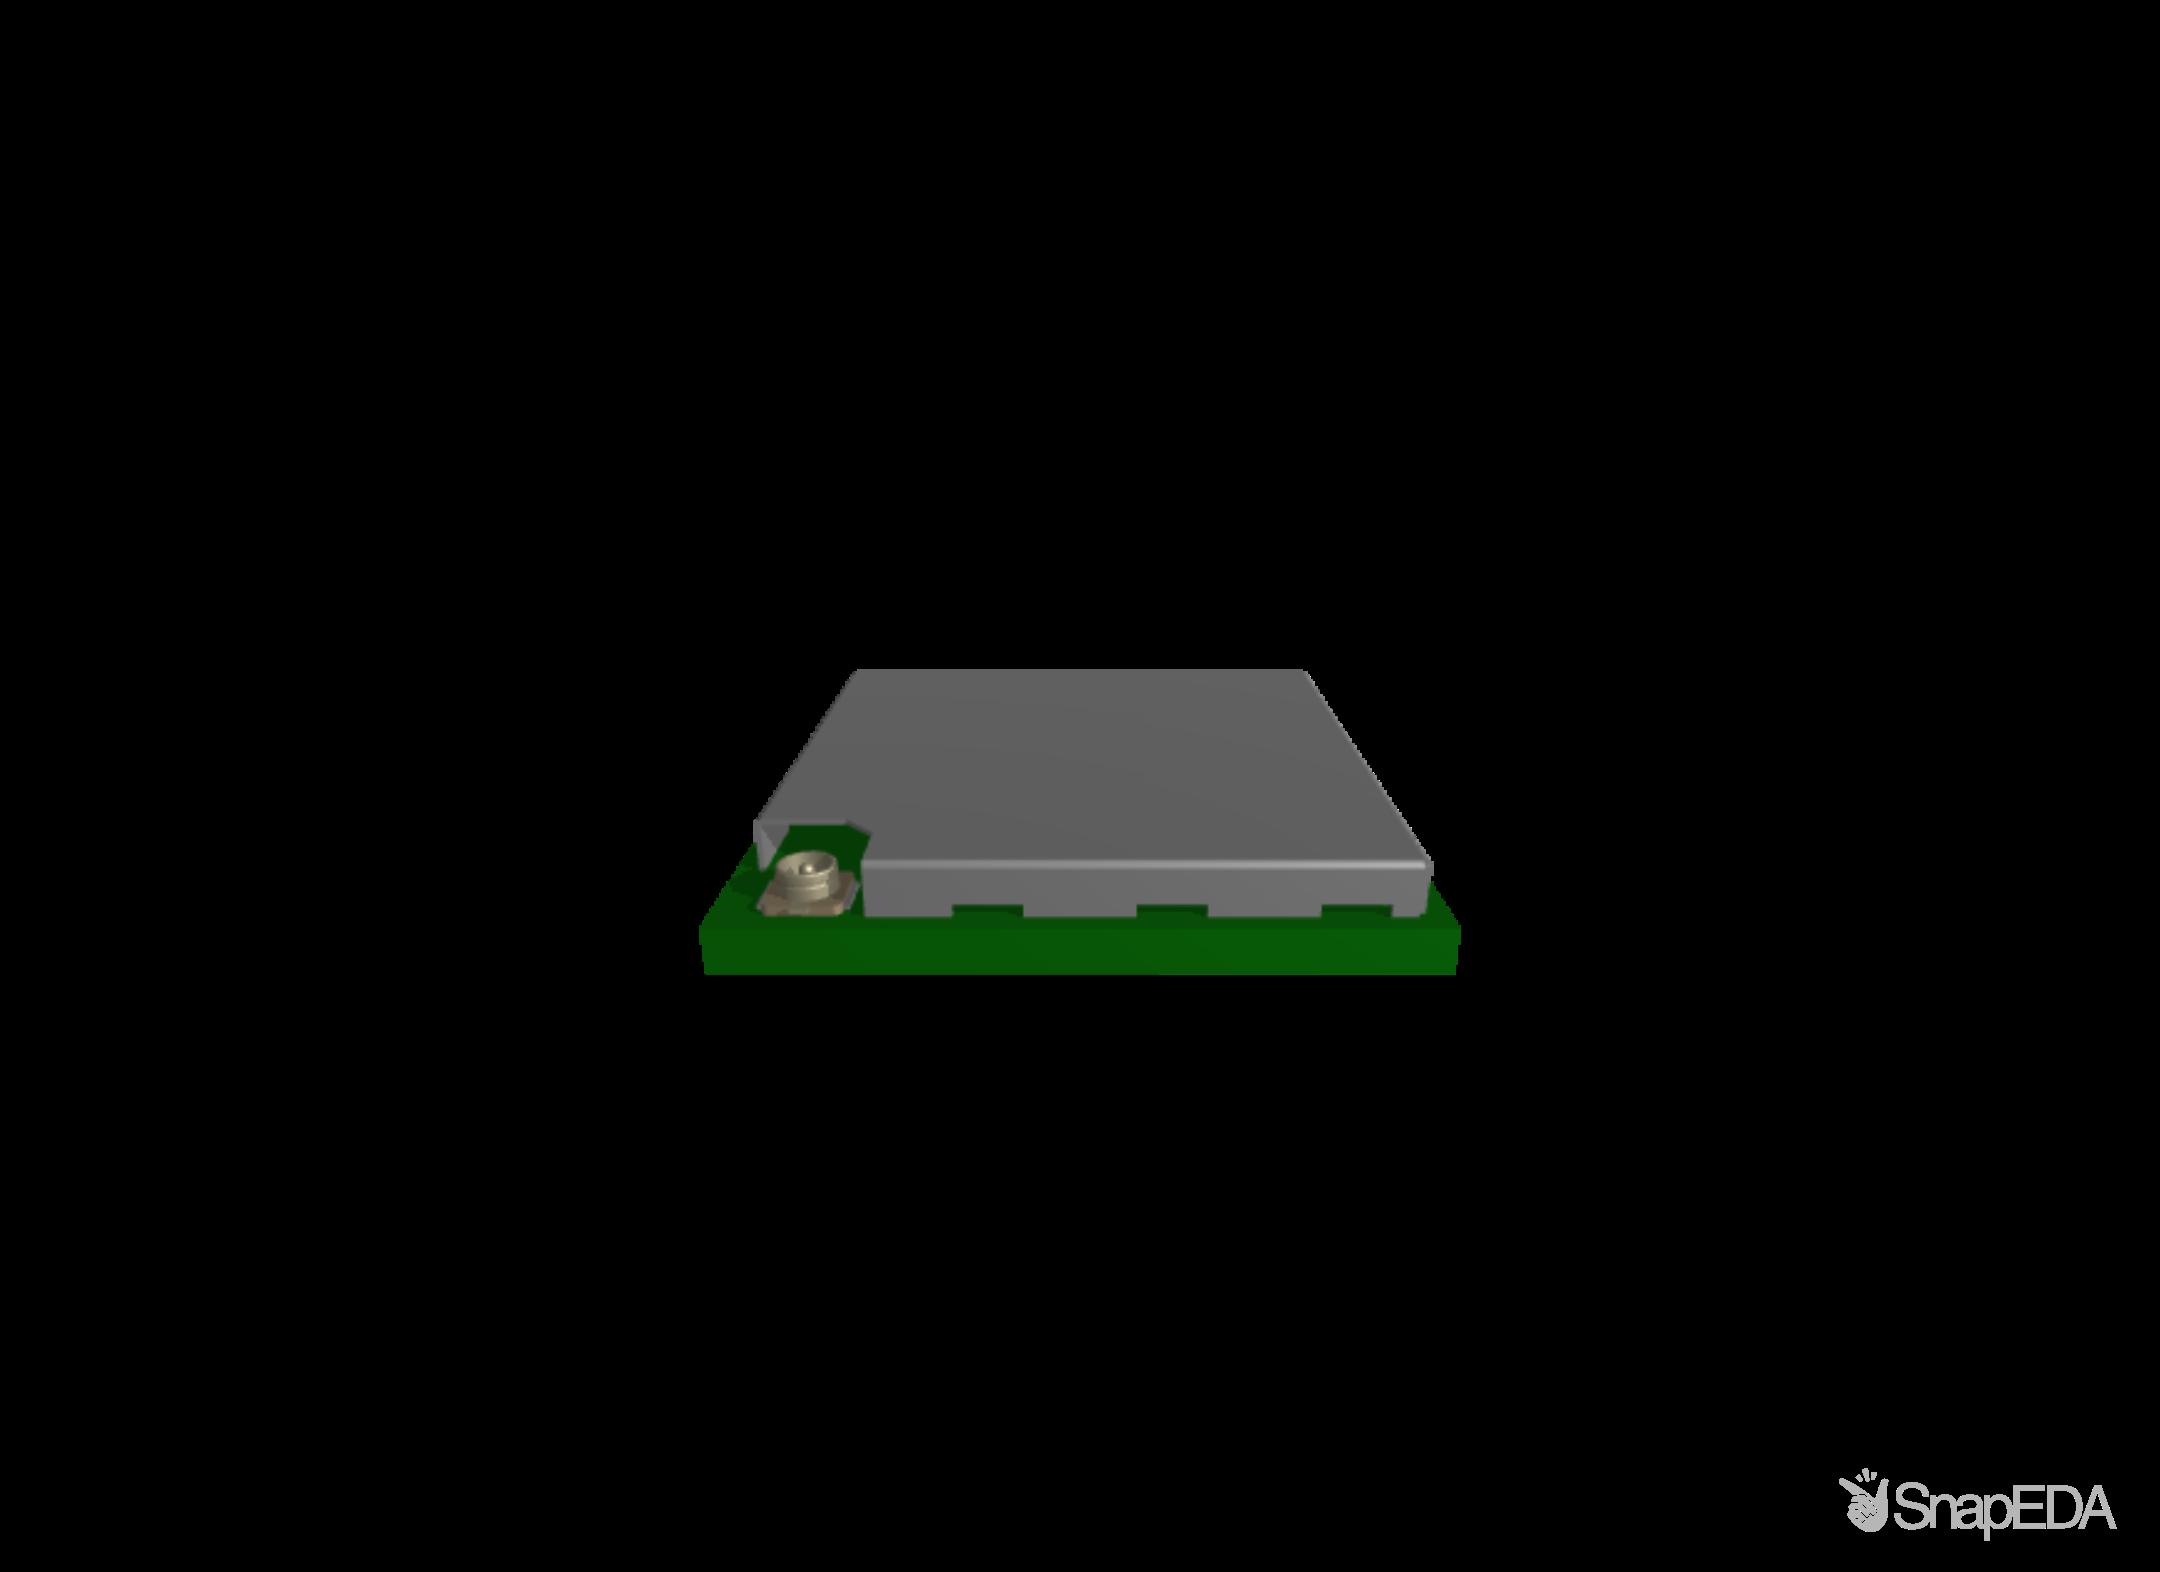 MTXDOT-EU1-IN1-A00-1 3D Model